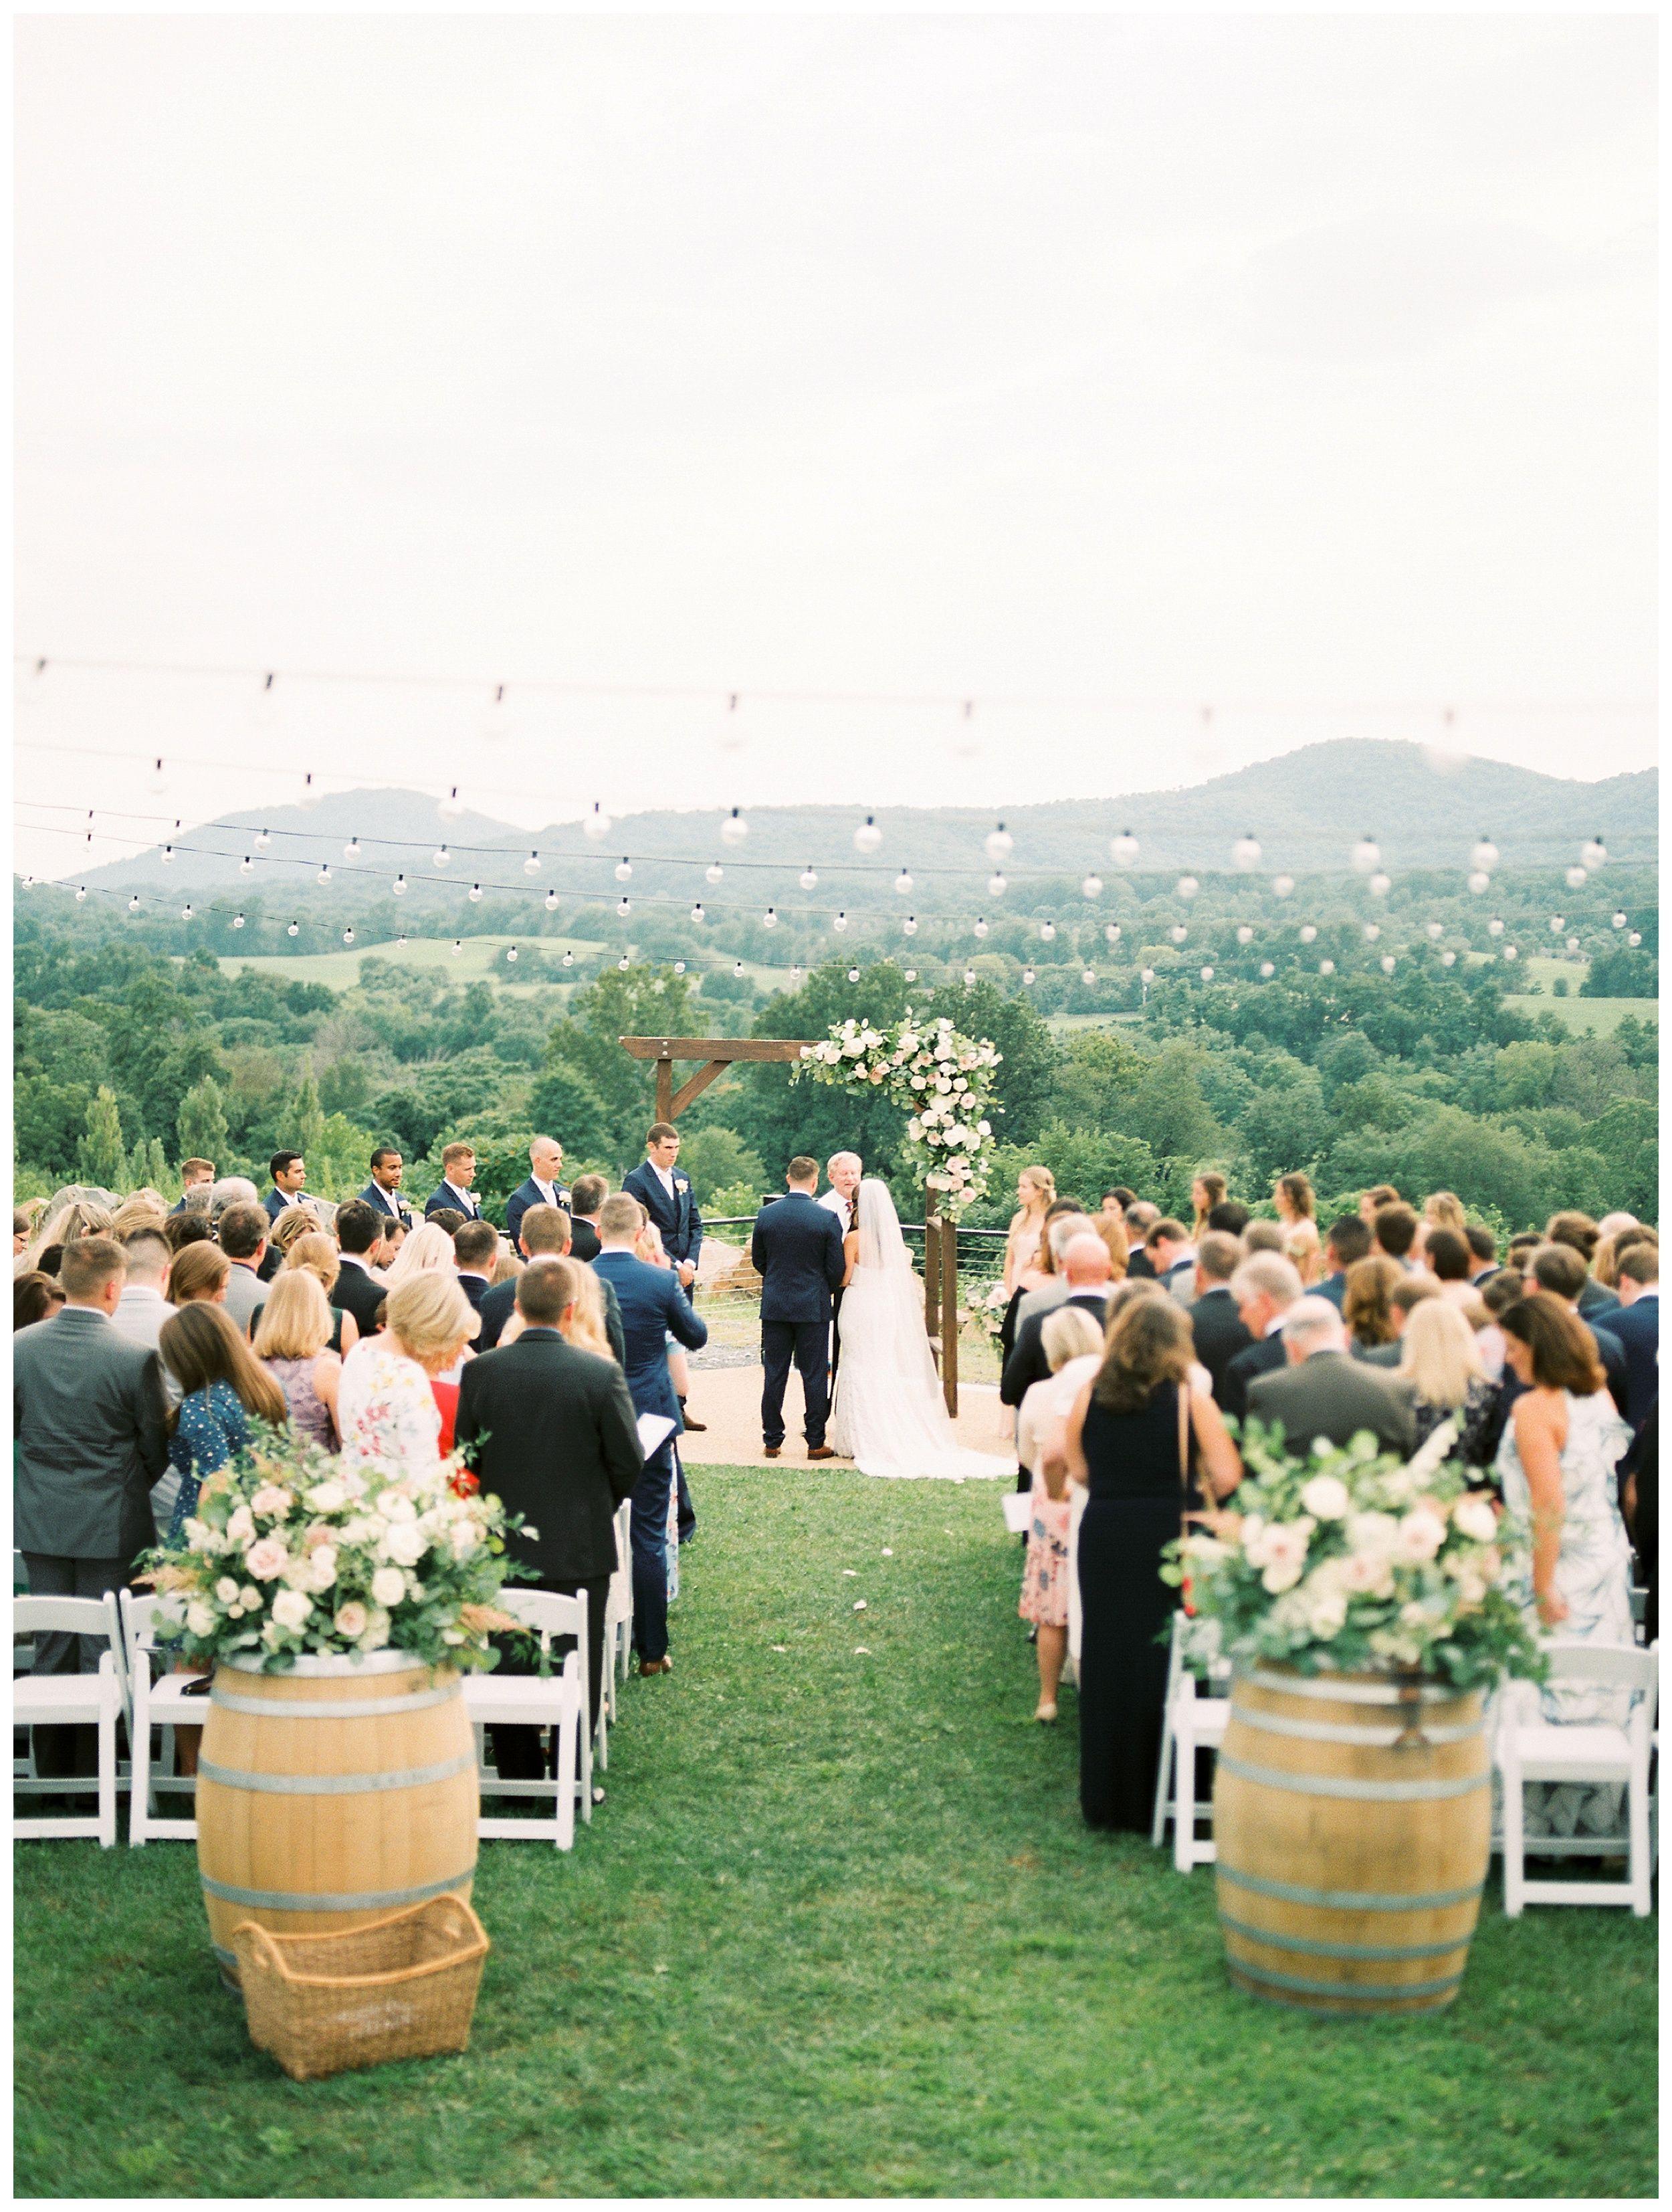 Blue Valley Vineyard Wedding Virginia Wedding Photographer Victoria And Andrew Kir2ben Com Virginia Winery Wedding Vineyard Wedding Venue Virginia Wedding Venues